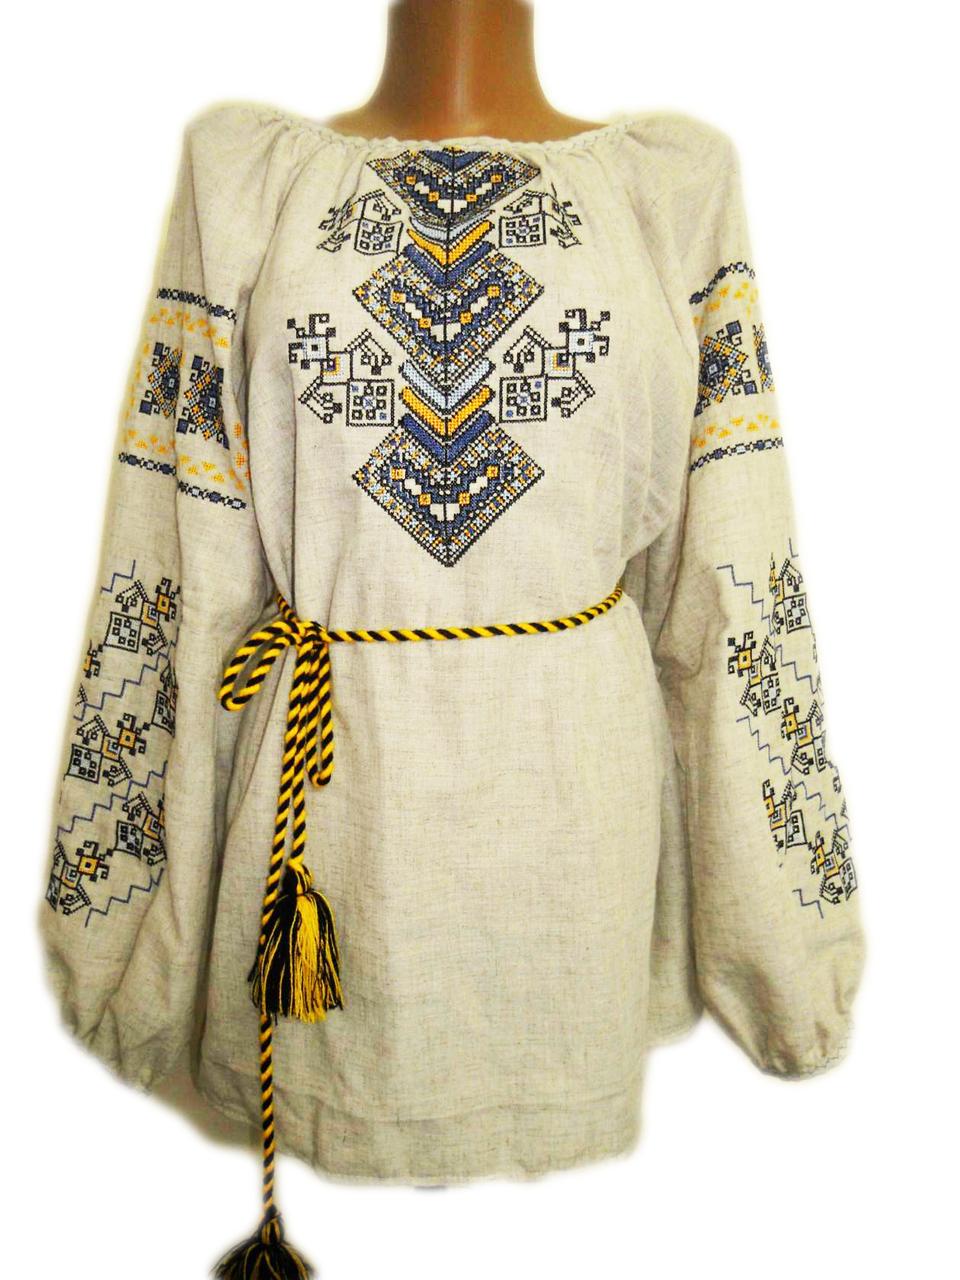 "Жіноча вишита сорочка (блузка) ""Кейрон"" (Женская вышитая рубашка (блузка) ""Кейрон"") BN-0058"